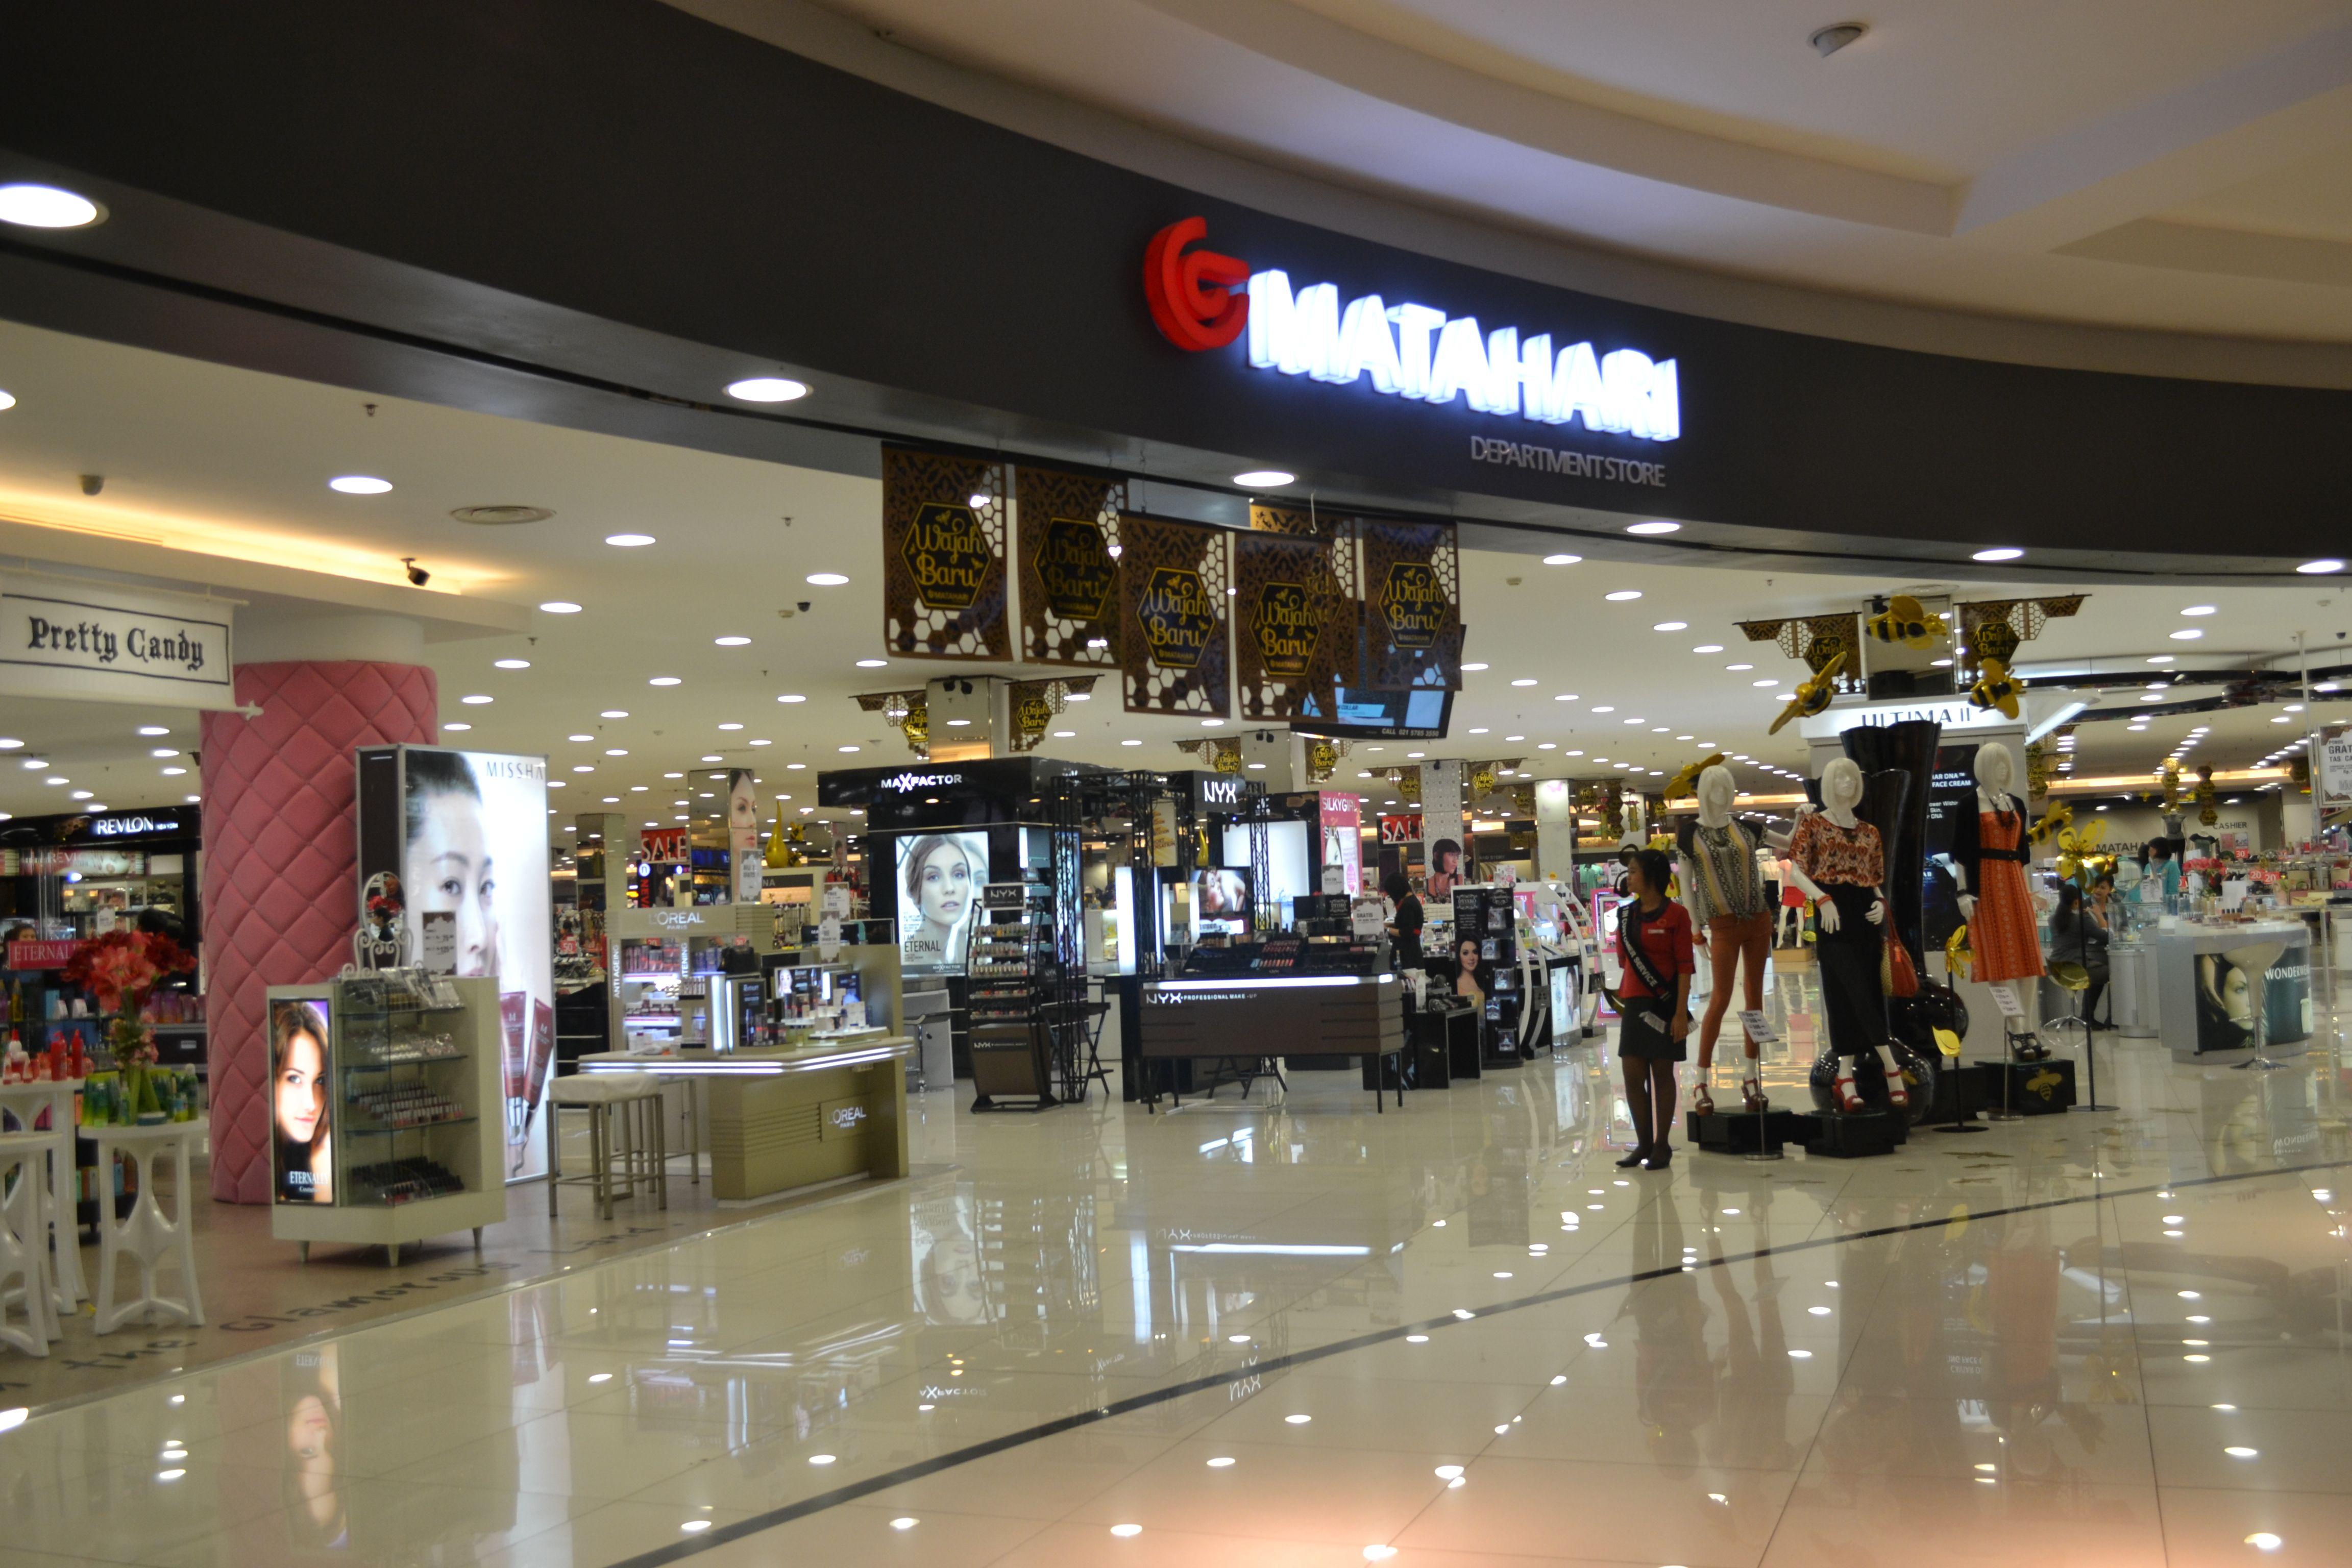 Matahari Dept. store lt. LG, UG, & Basement , west atrium